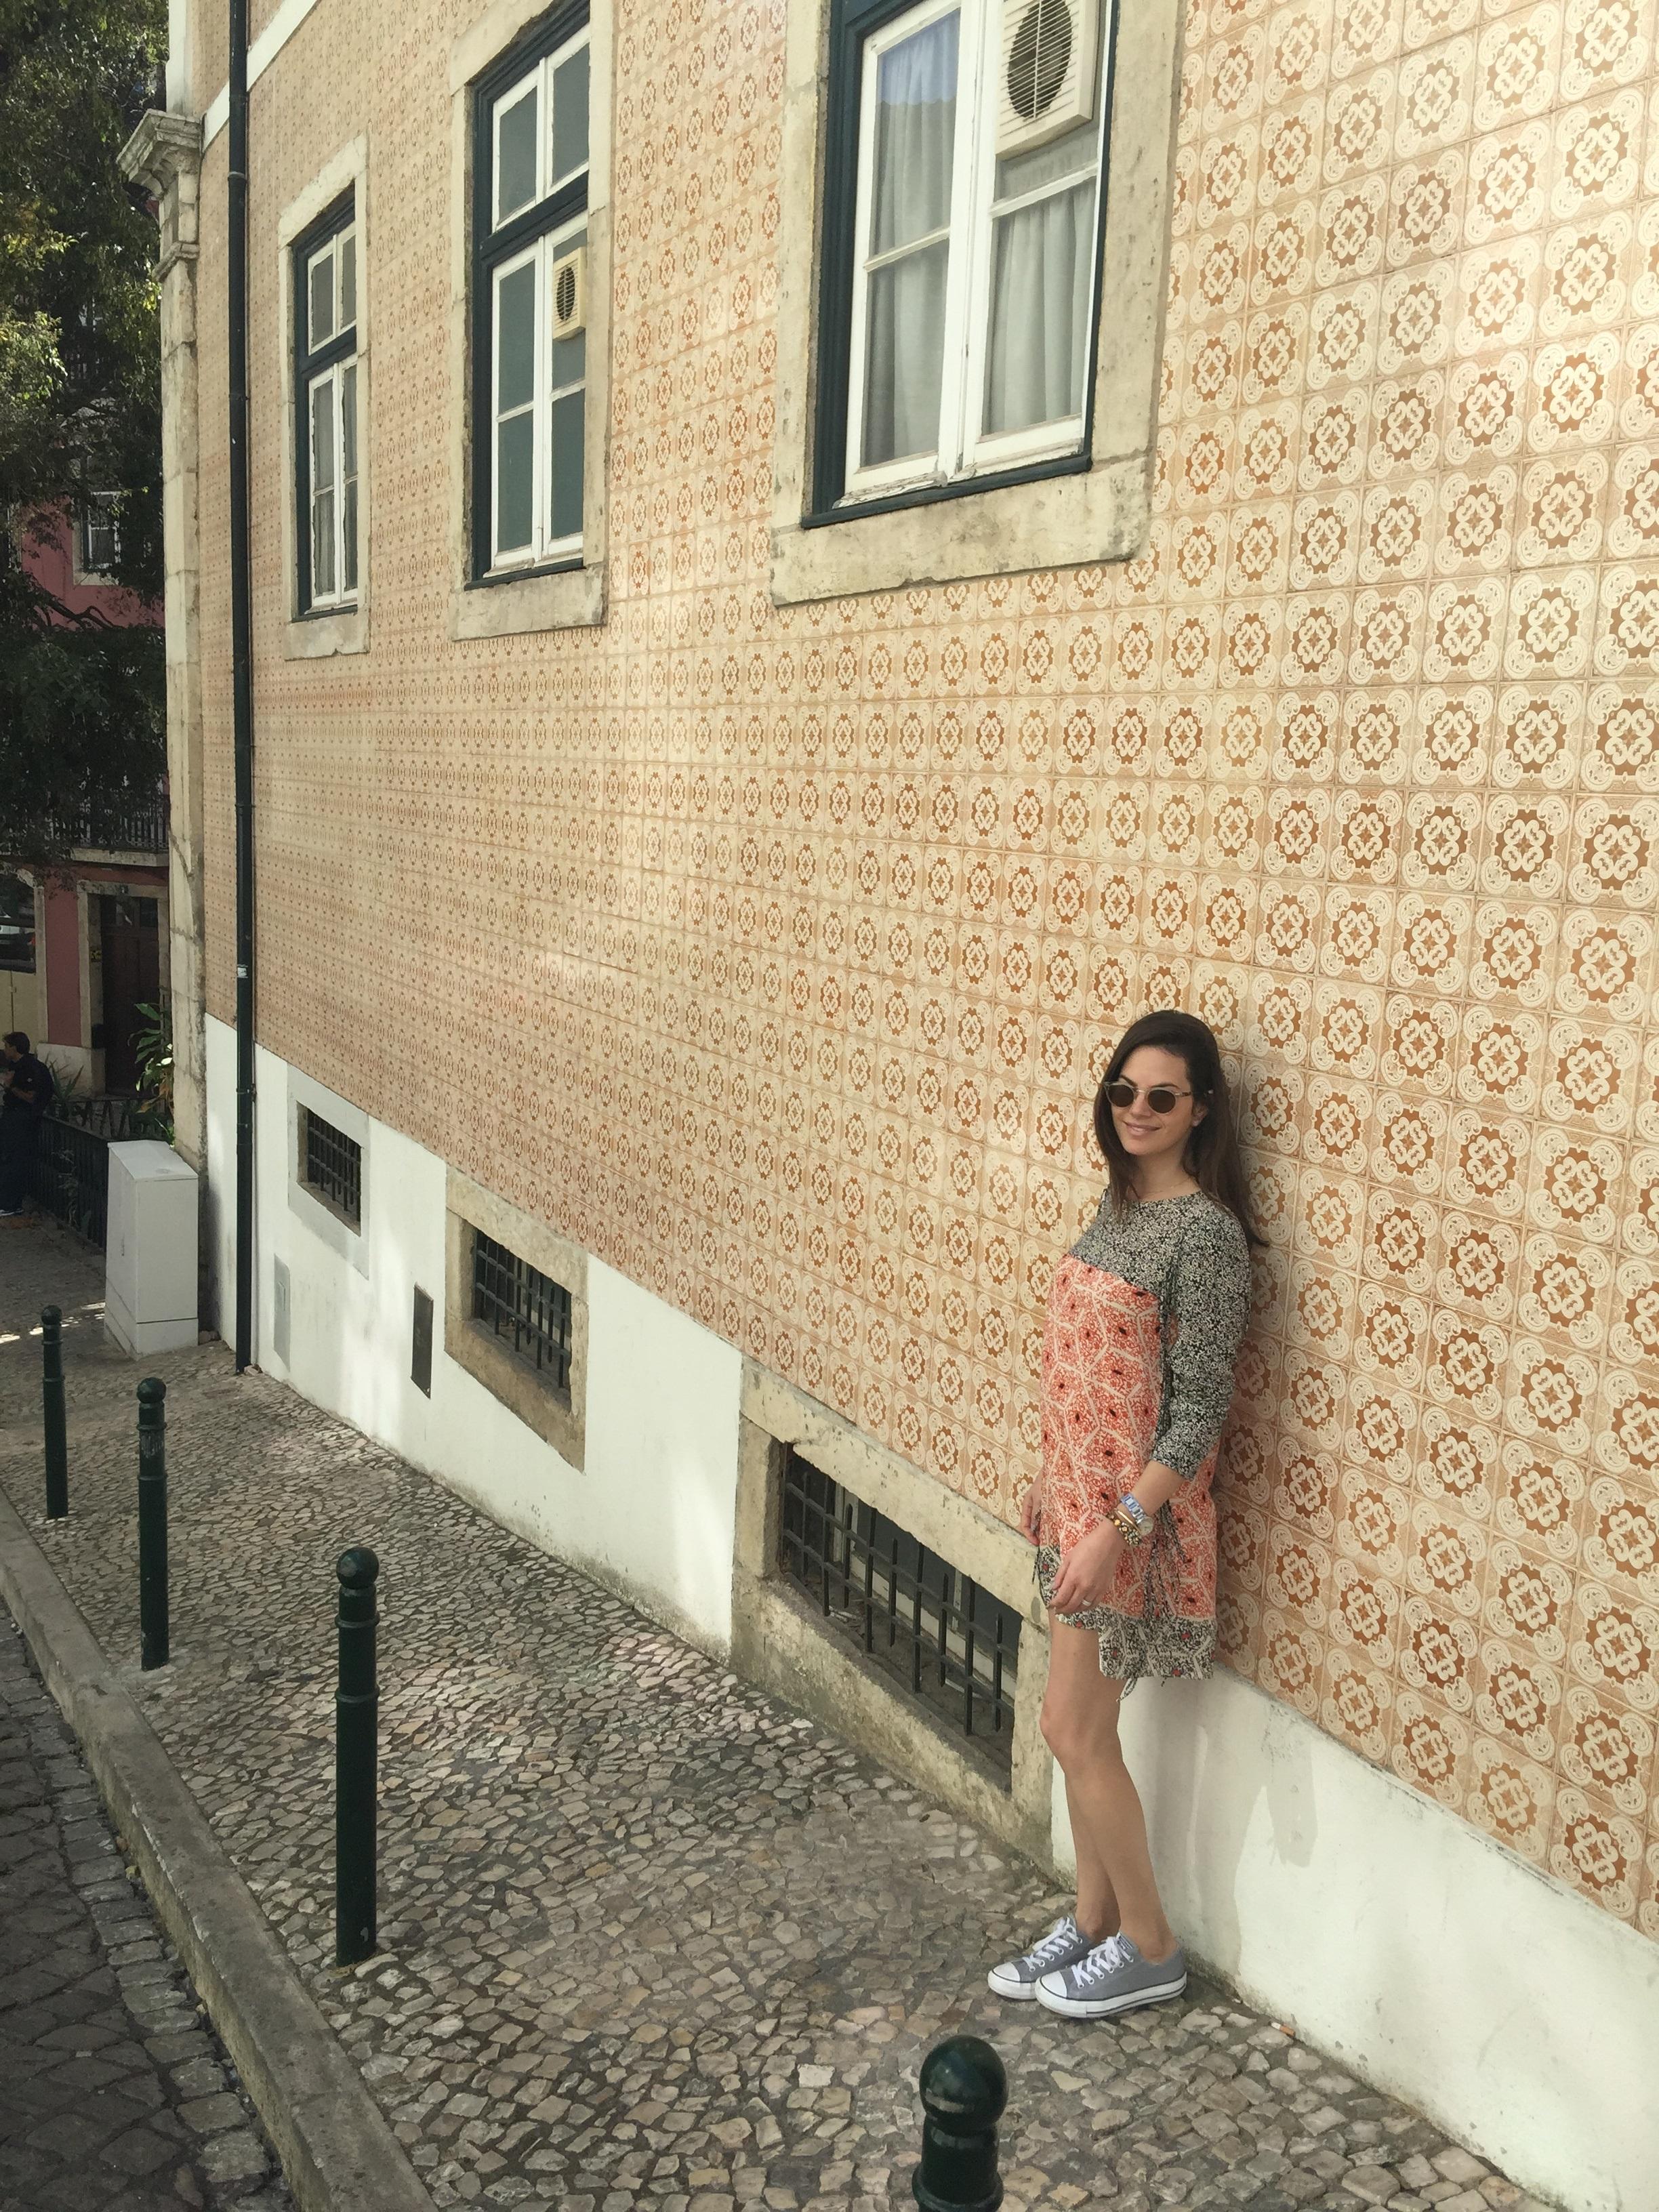 Tile Matching Dress